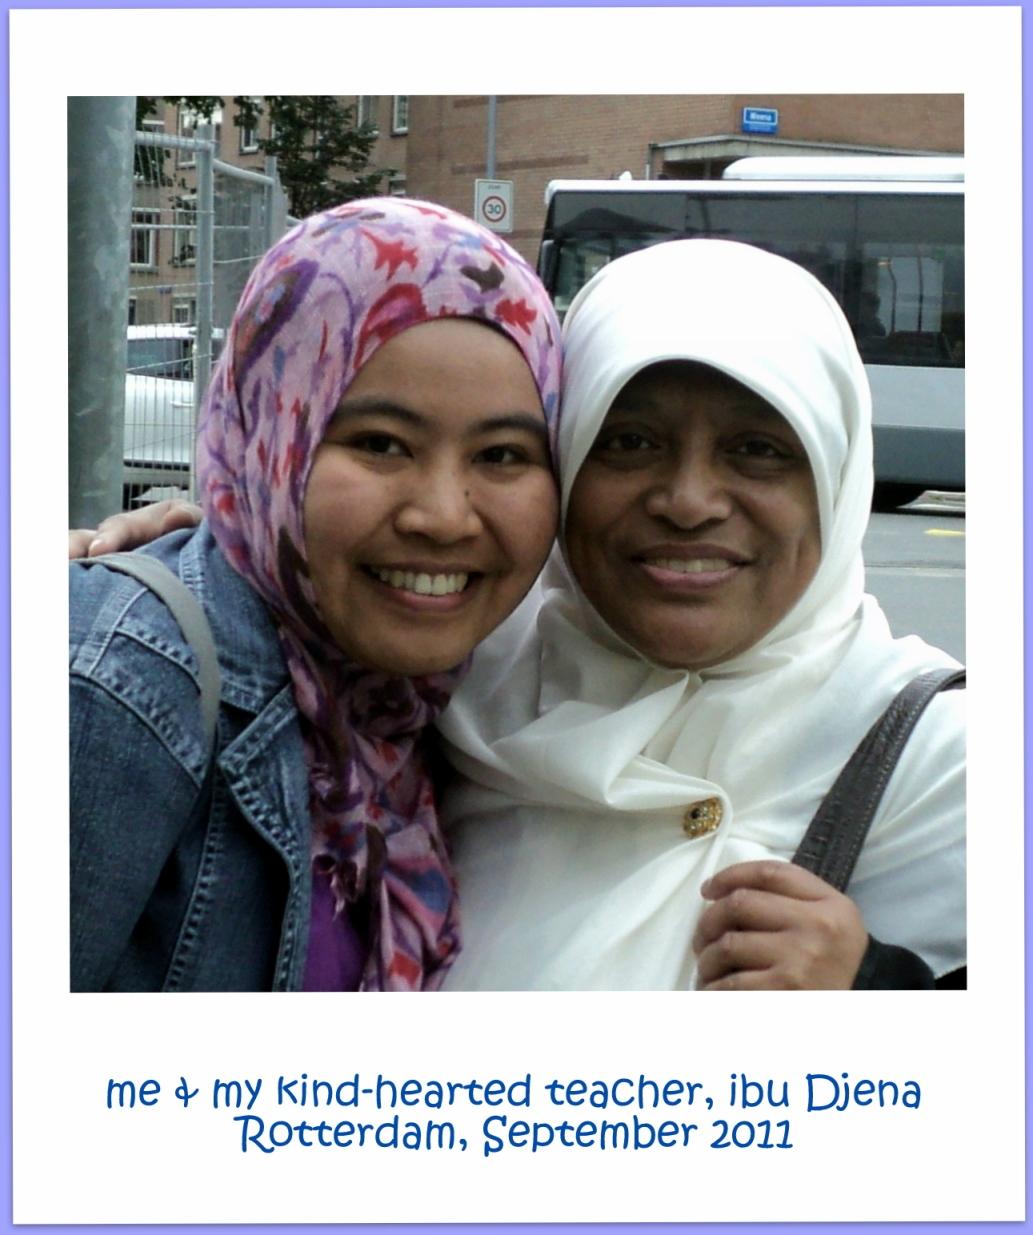 met ibu Djena, mijn lerares before i went back home Indonesia